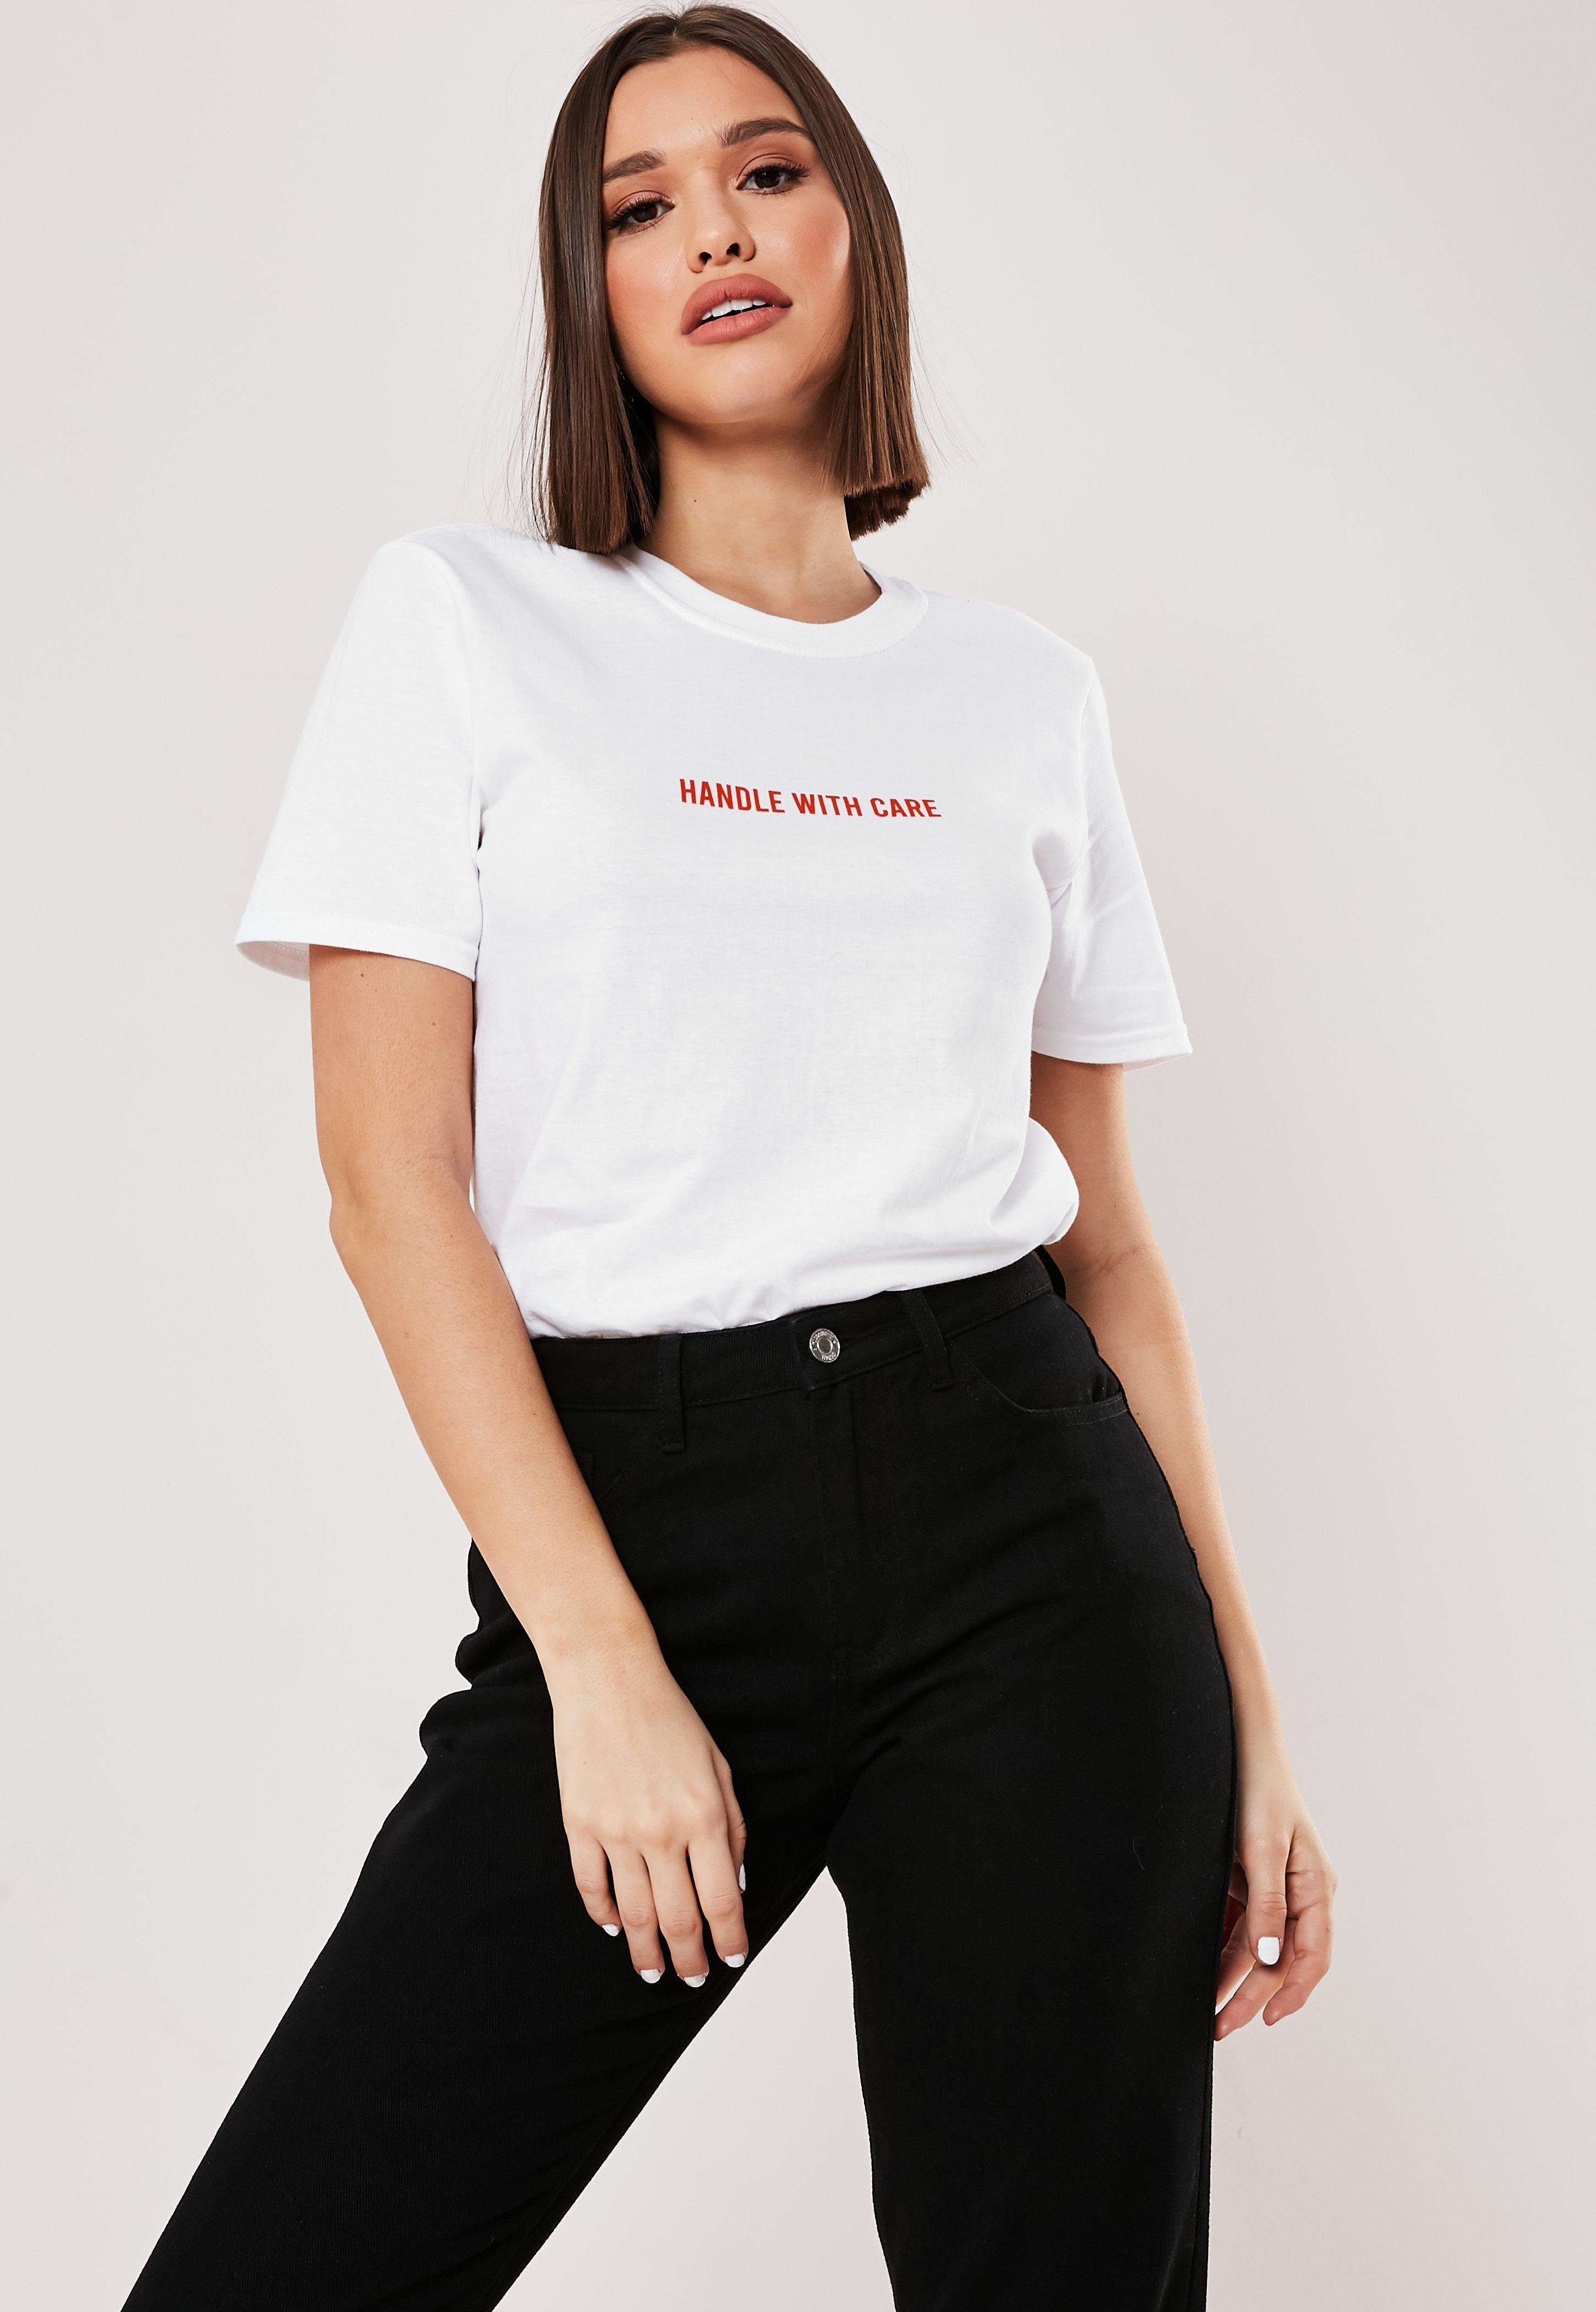 f9c9eca3 Slogan T-Shirts   Slogan Tees & Printed T-Shirts - Missguided